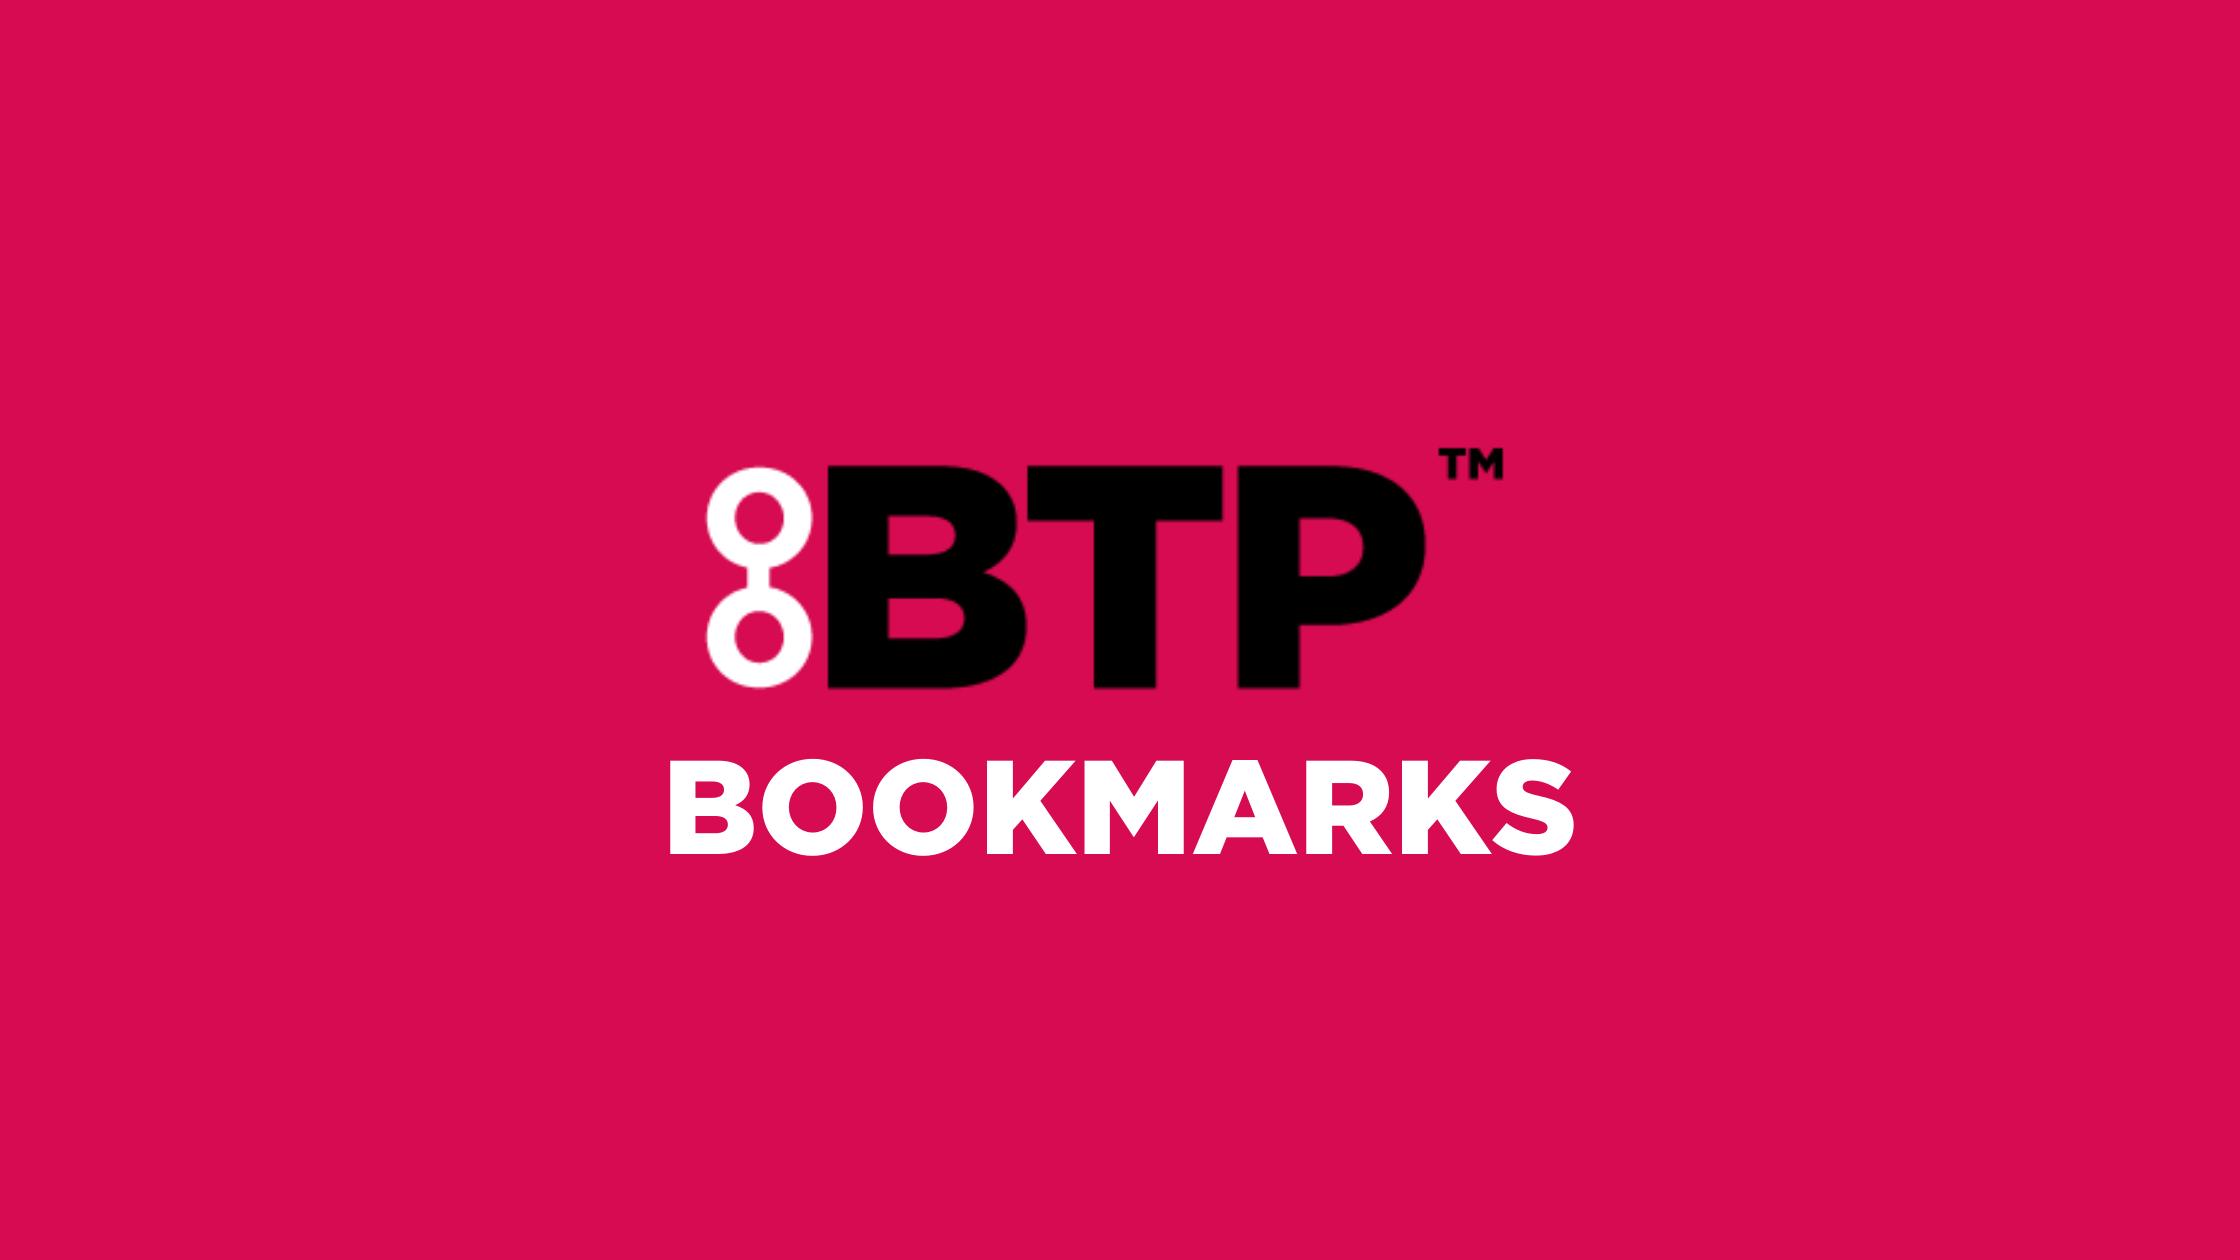 Shop the BTP Bookmarks